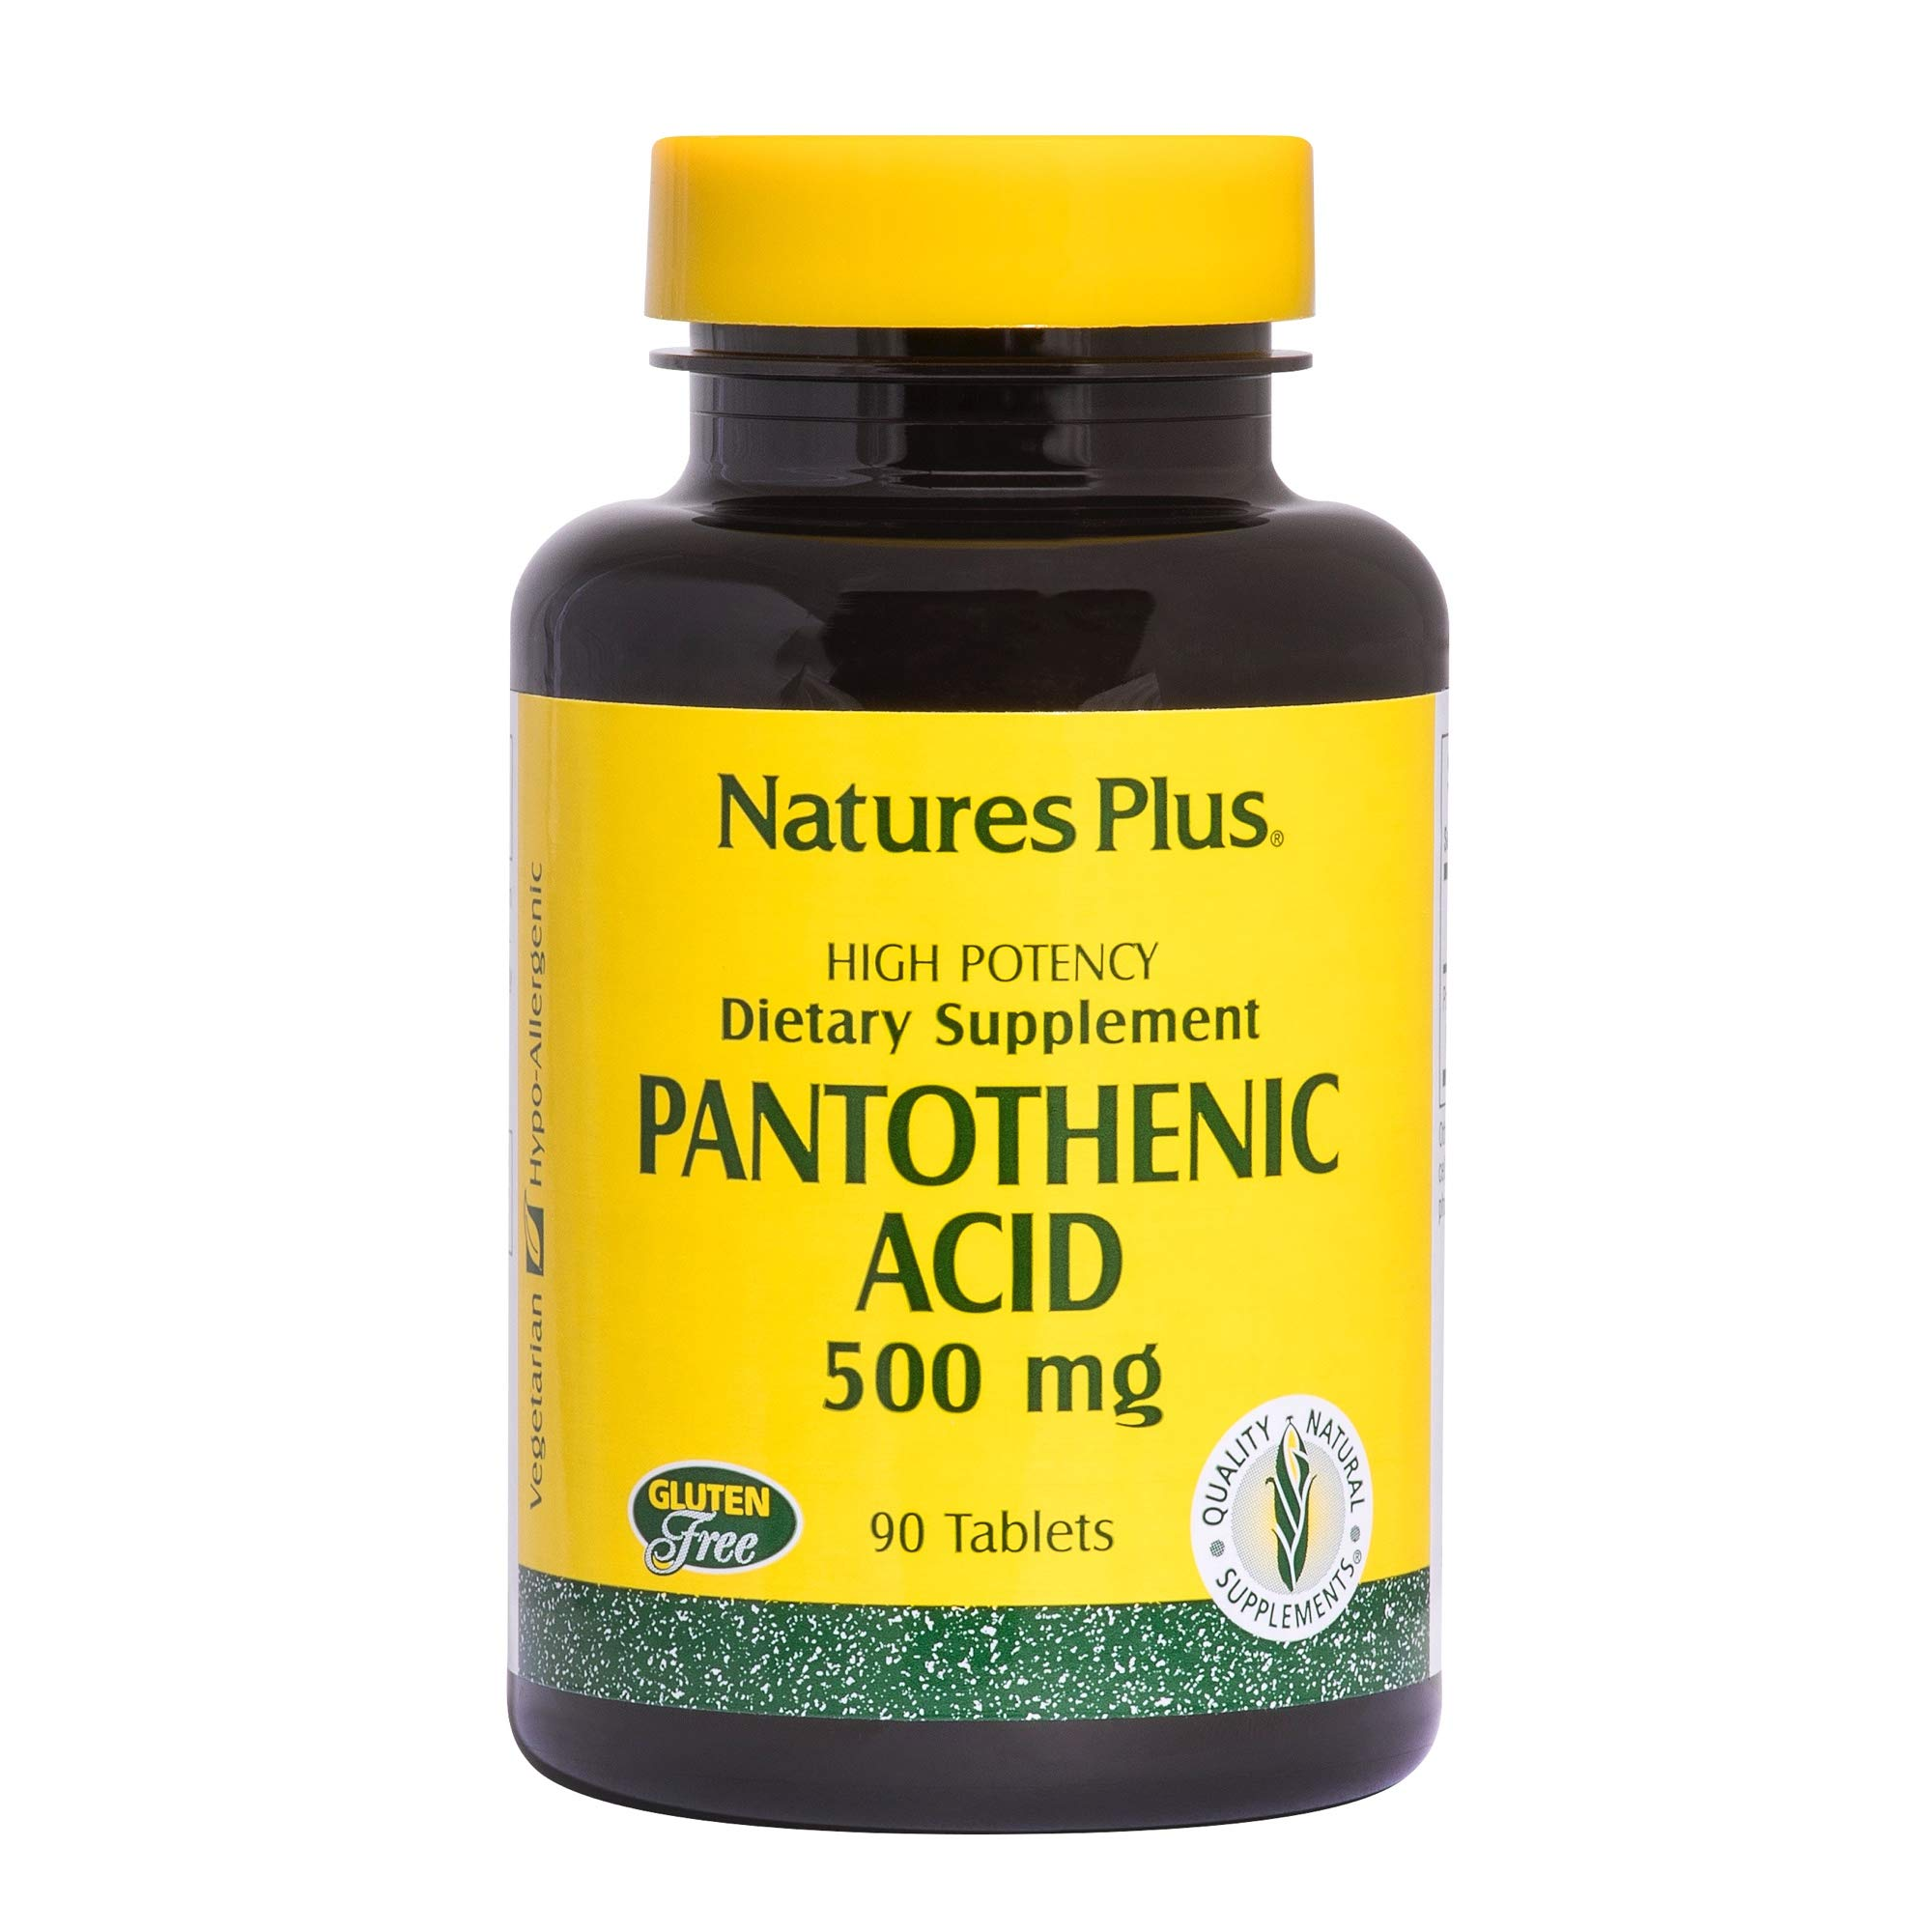 NaturesPlus Pantothenic Acid - 500 mg, 90 Vegetarian Tablets - Vitamin B5 Supplement, Supports Food Metabolism, Promotes Healthy Nervous System, Energy Production - Gluten-Free - 90 Servings